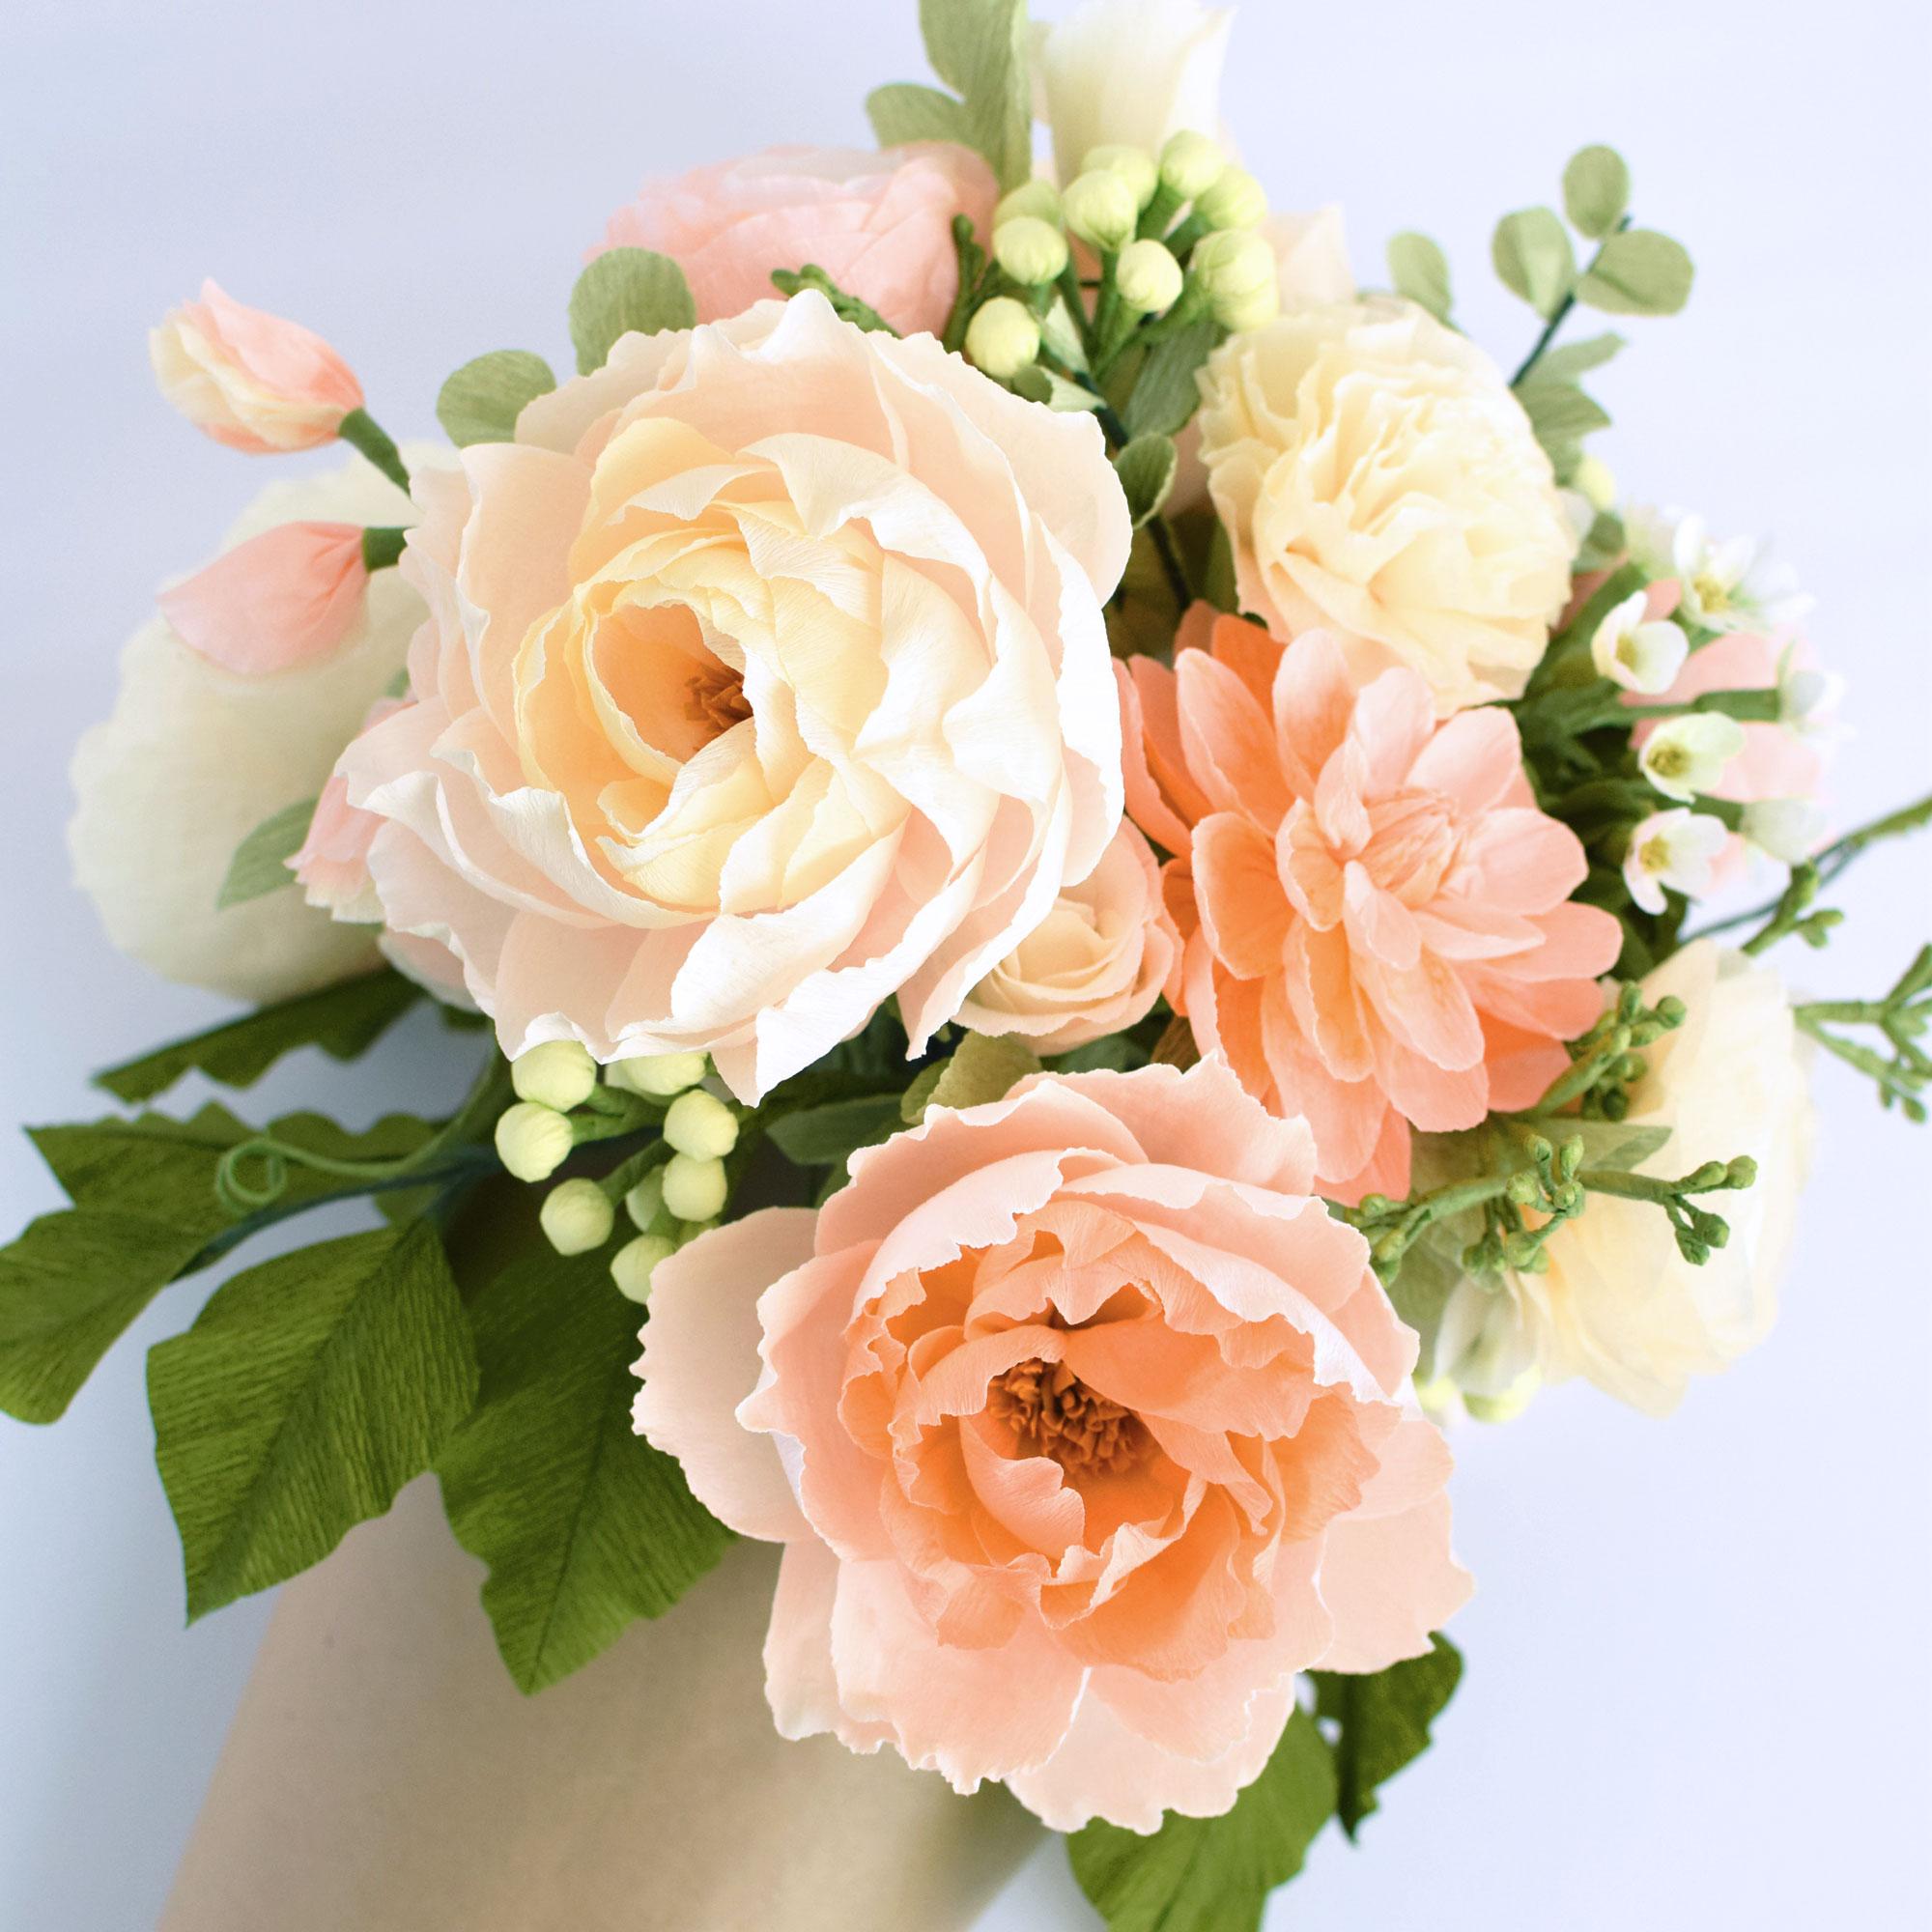 Vanilla-Peach-Bouquet-feature-image-craftedtobloom-paperflowers.jpg